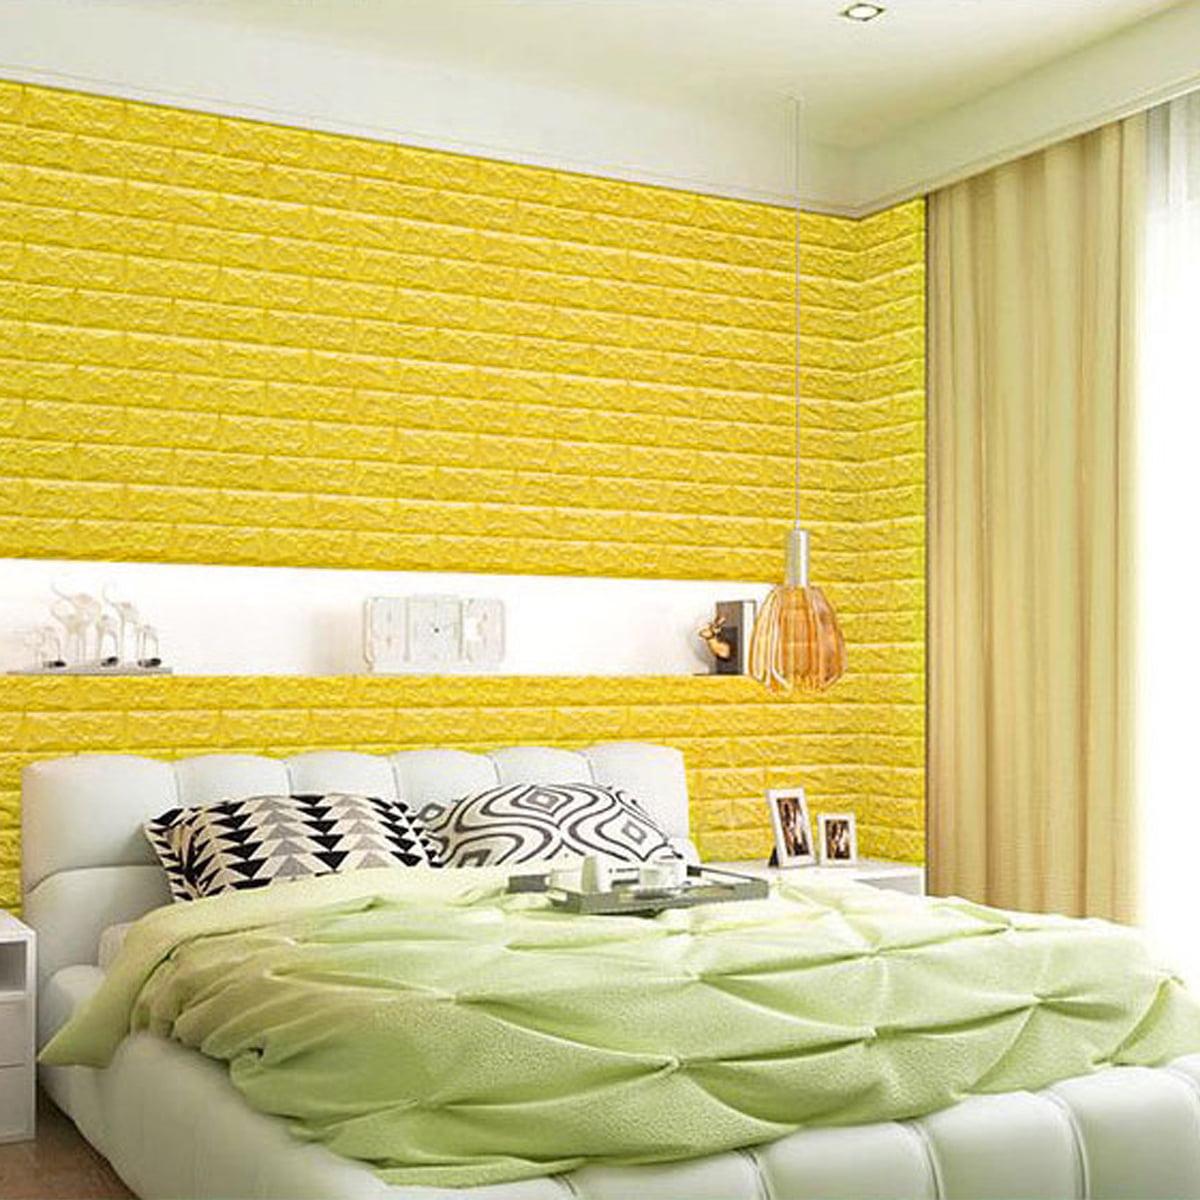 10 Pcs 3D Wallpaper Waterproof Large Tile Brick Wall